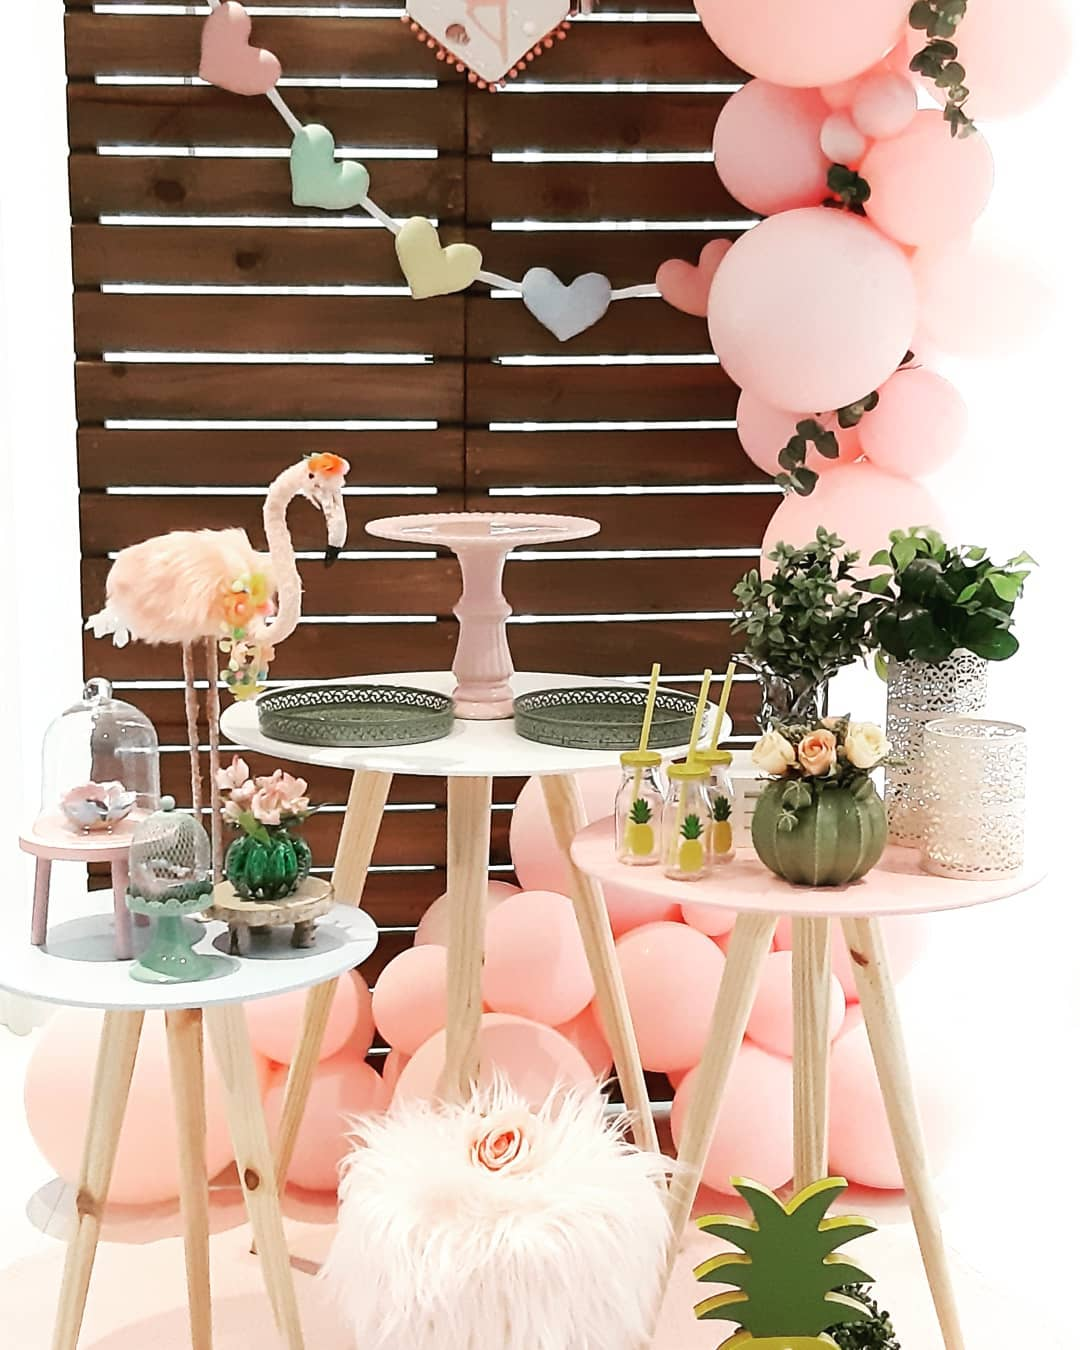 festa flamingo delicada em tons pasteis